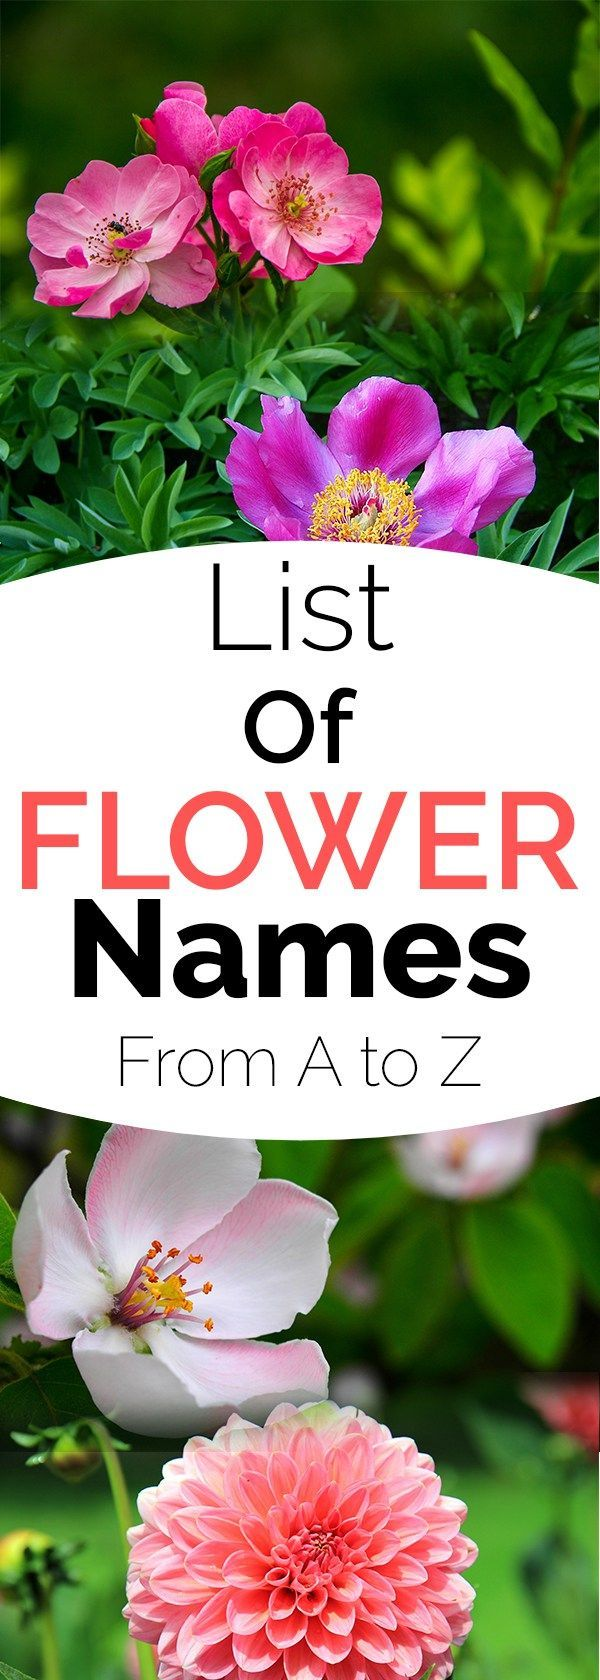 Best 25 List Of Flower Names Ideas On Pinterest Pink